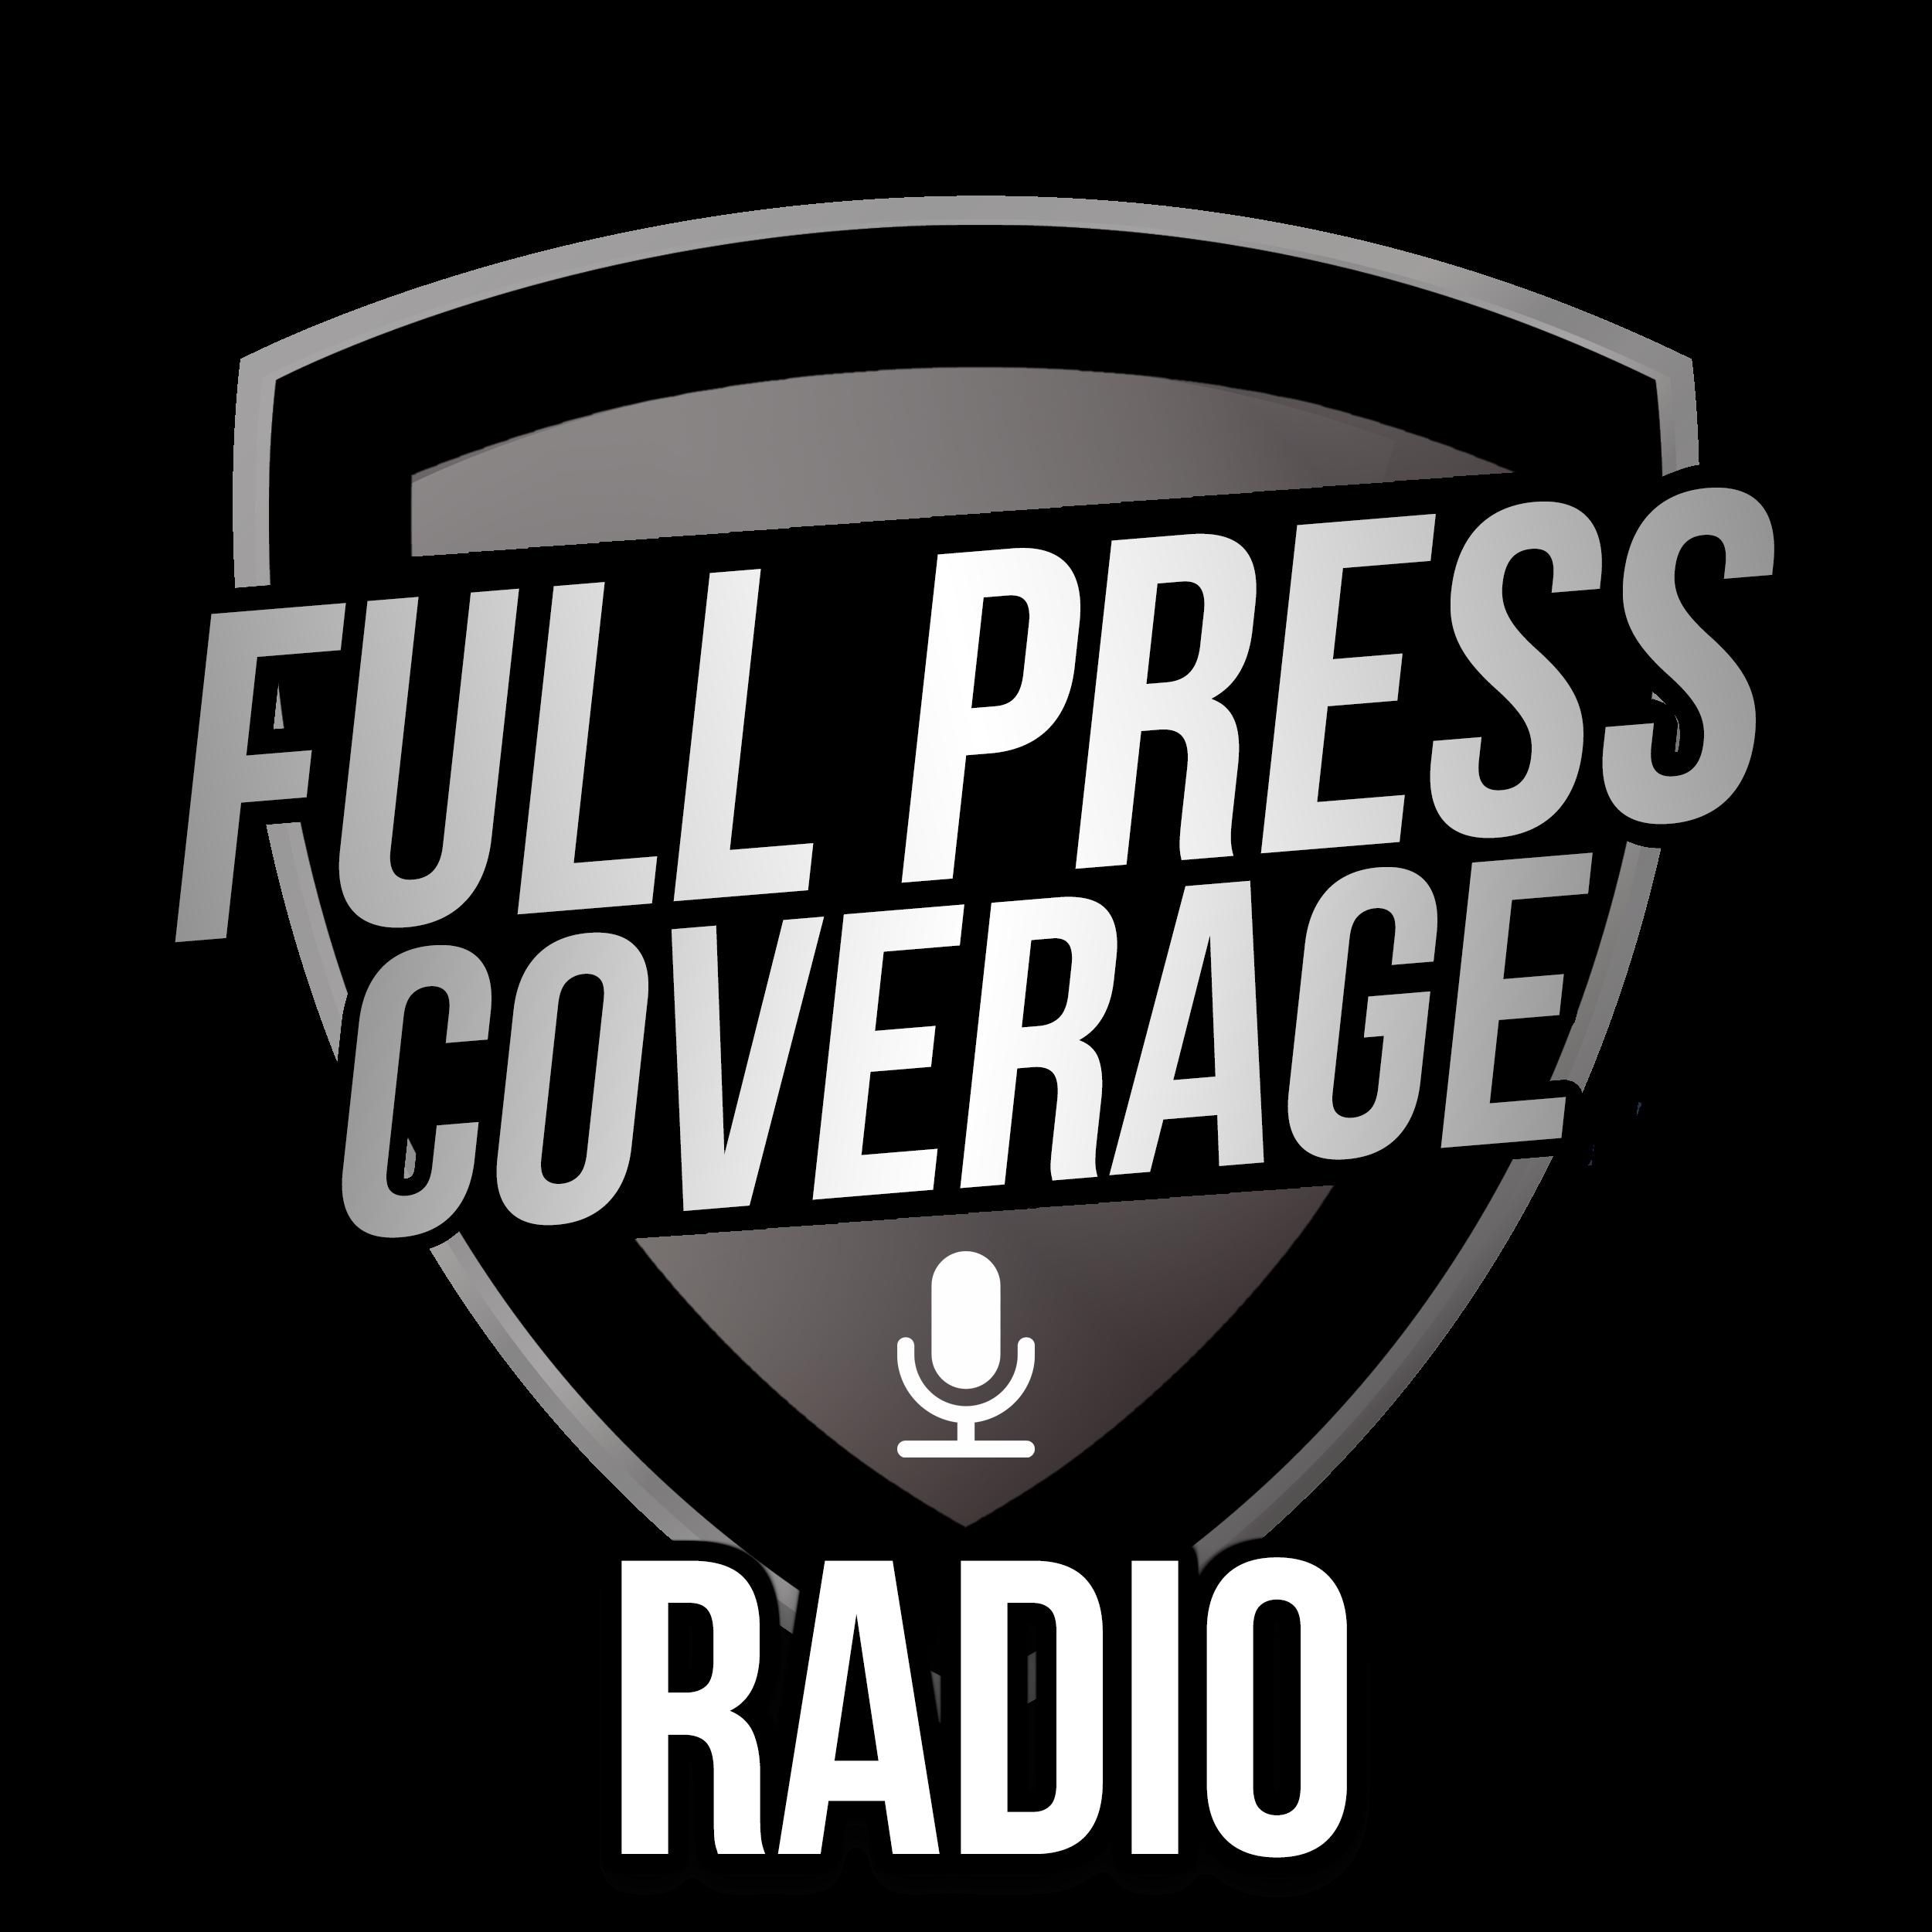 Full Press Radio